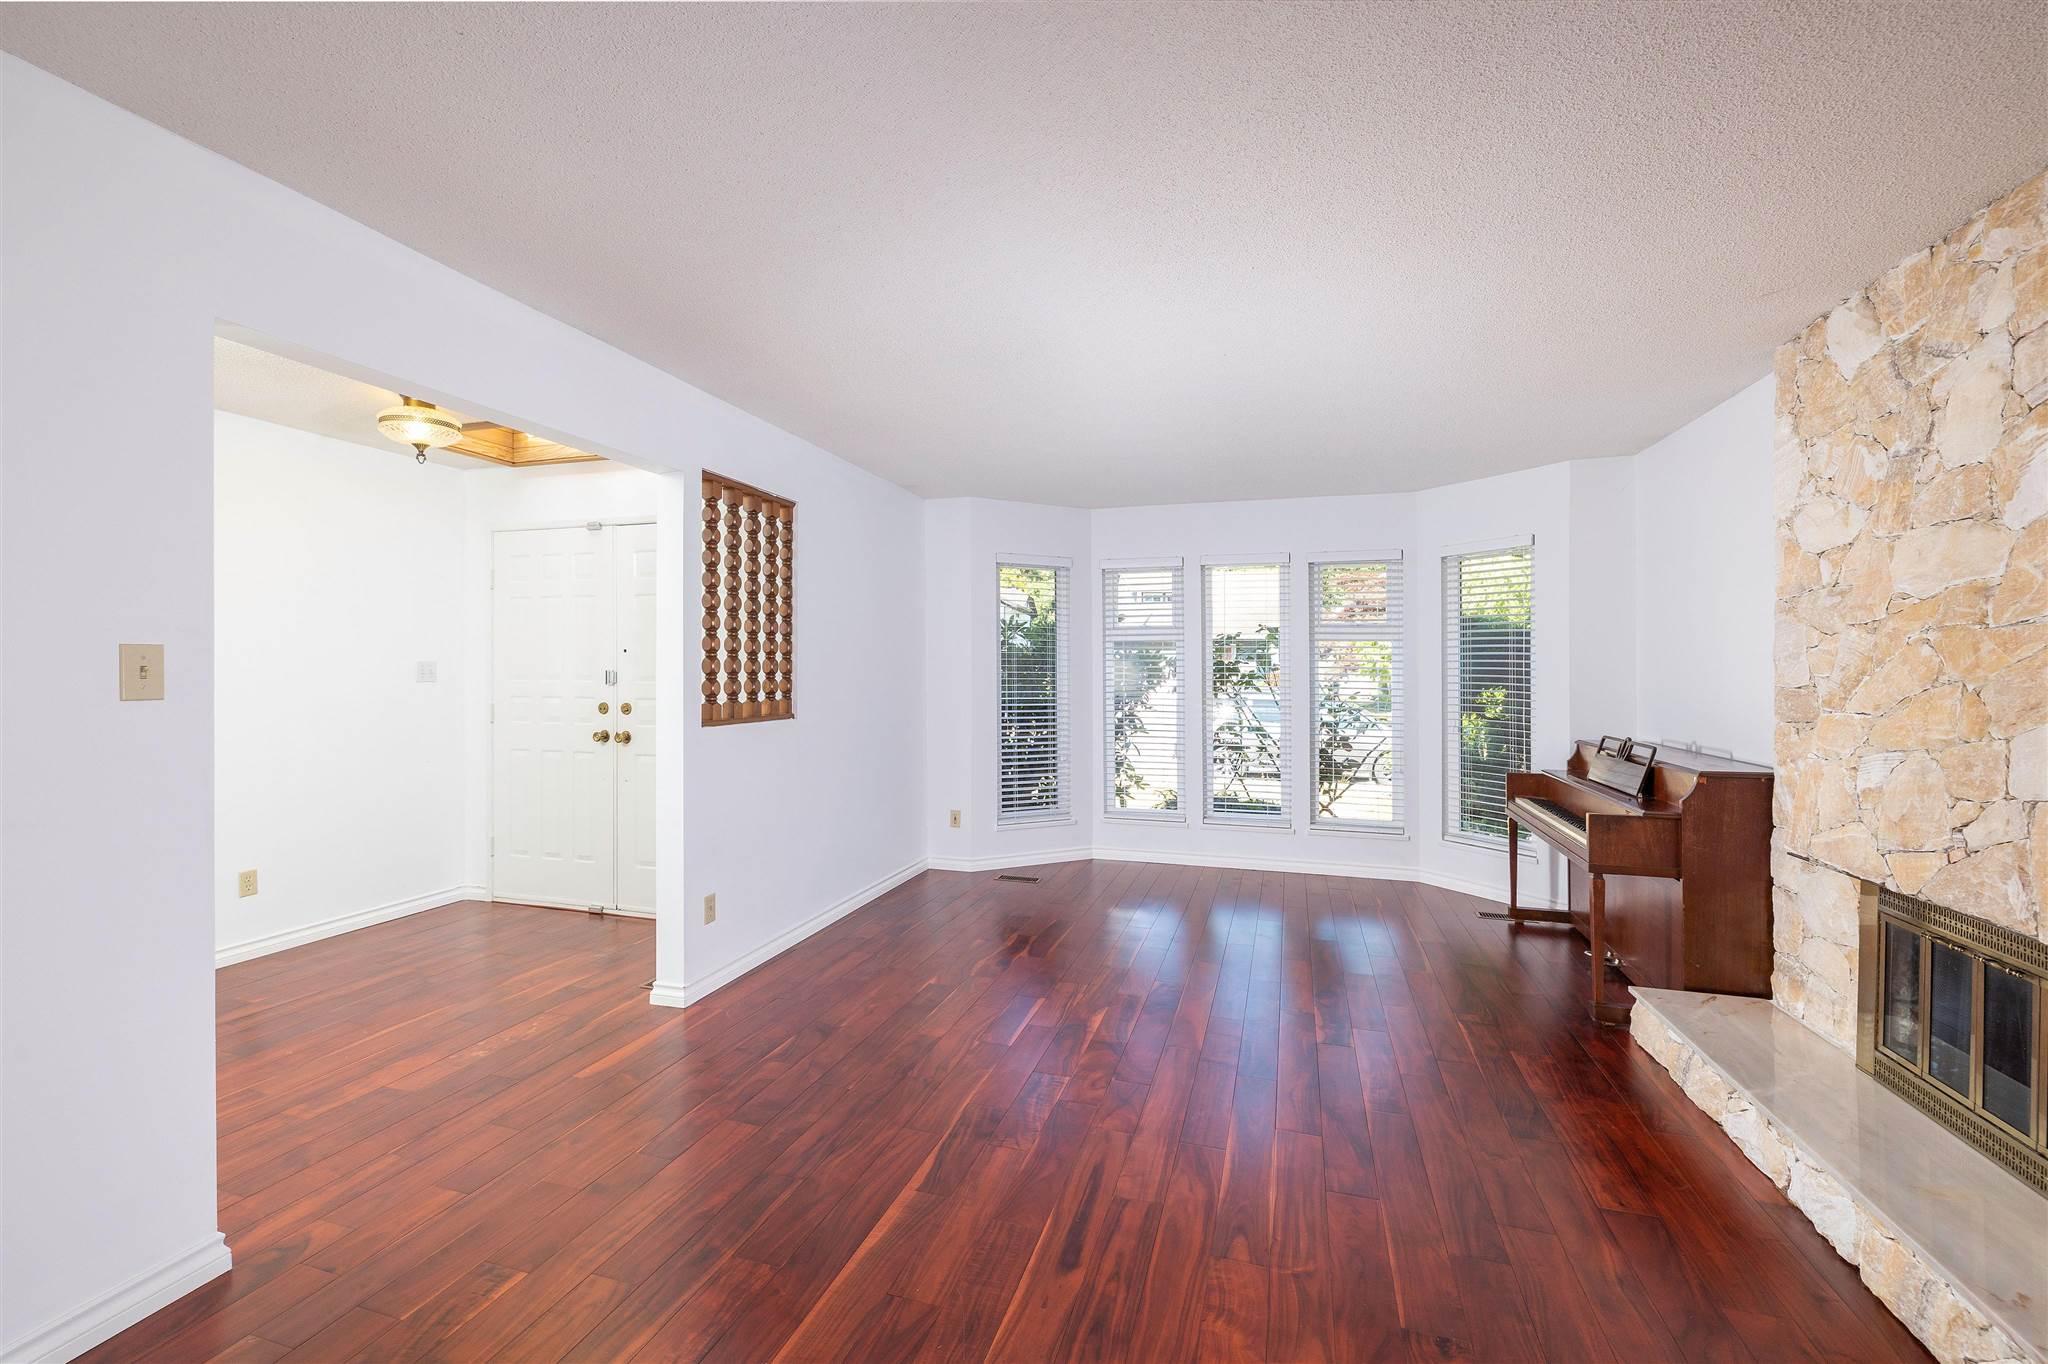 1743 148A STREET - Sunnyside Park Surrey House/Single Family for sale, 3 Bedrooms (R2604804) - #4